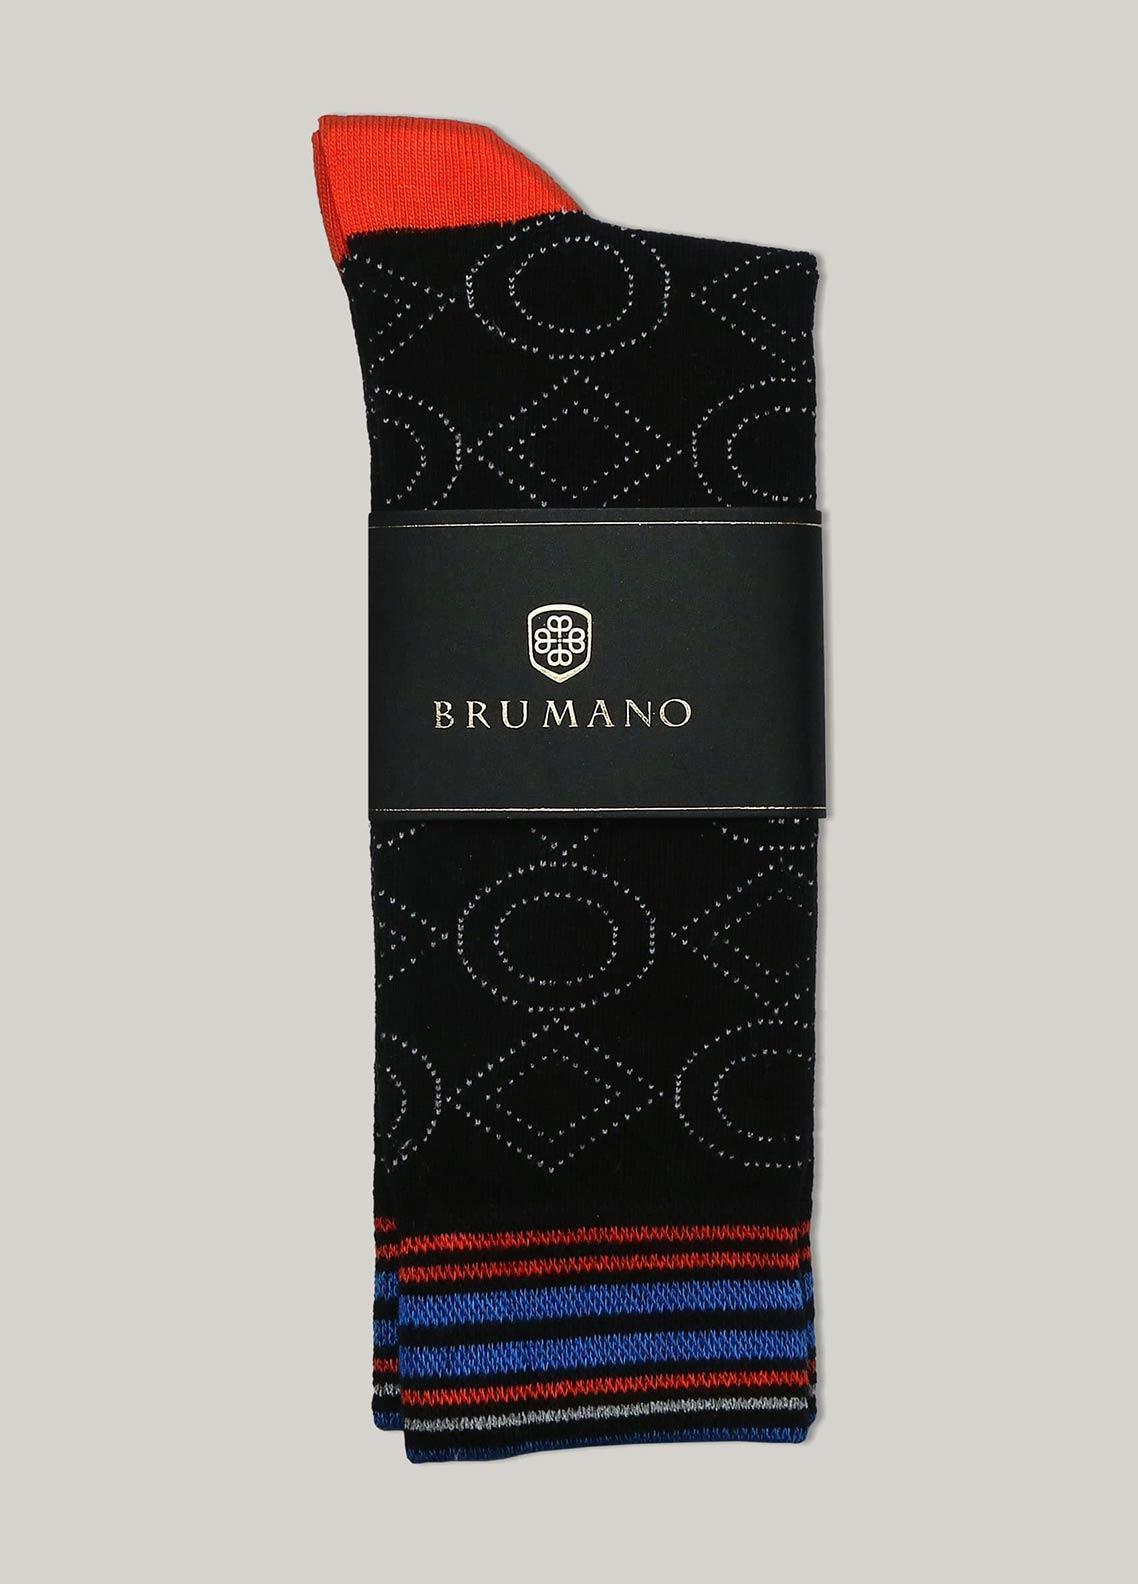 Brumano Cotton Socks BM20CSK Black & Orange Contrasting Cotton Socks